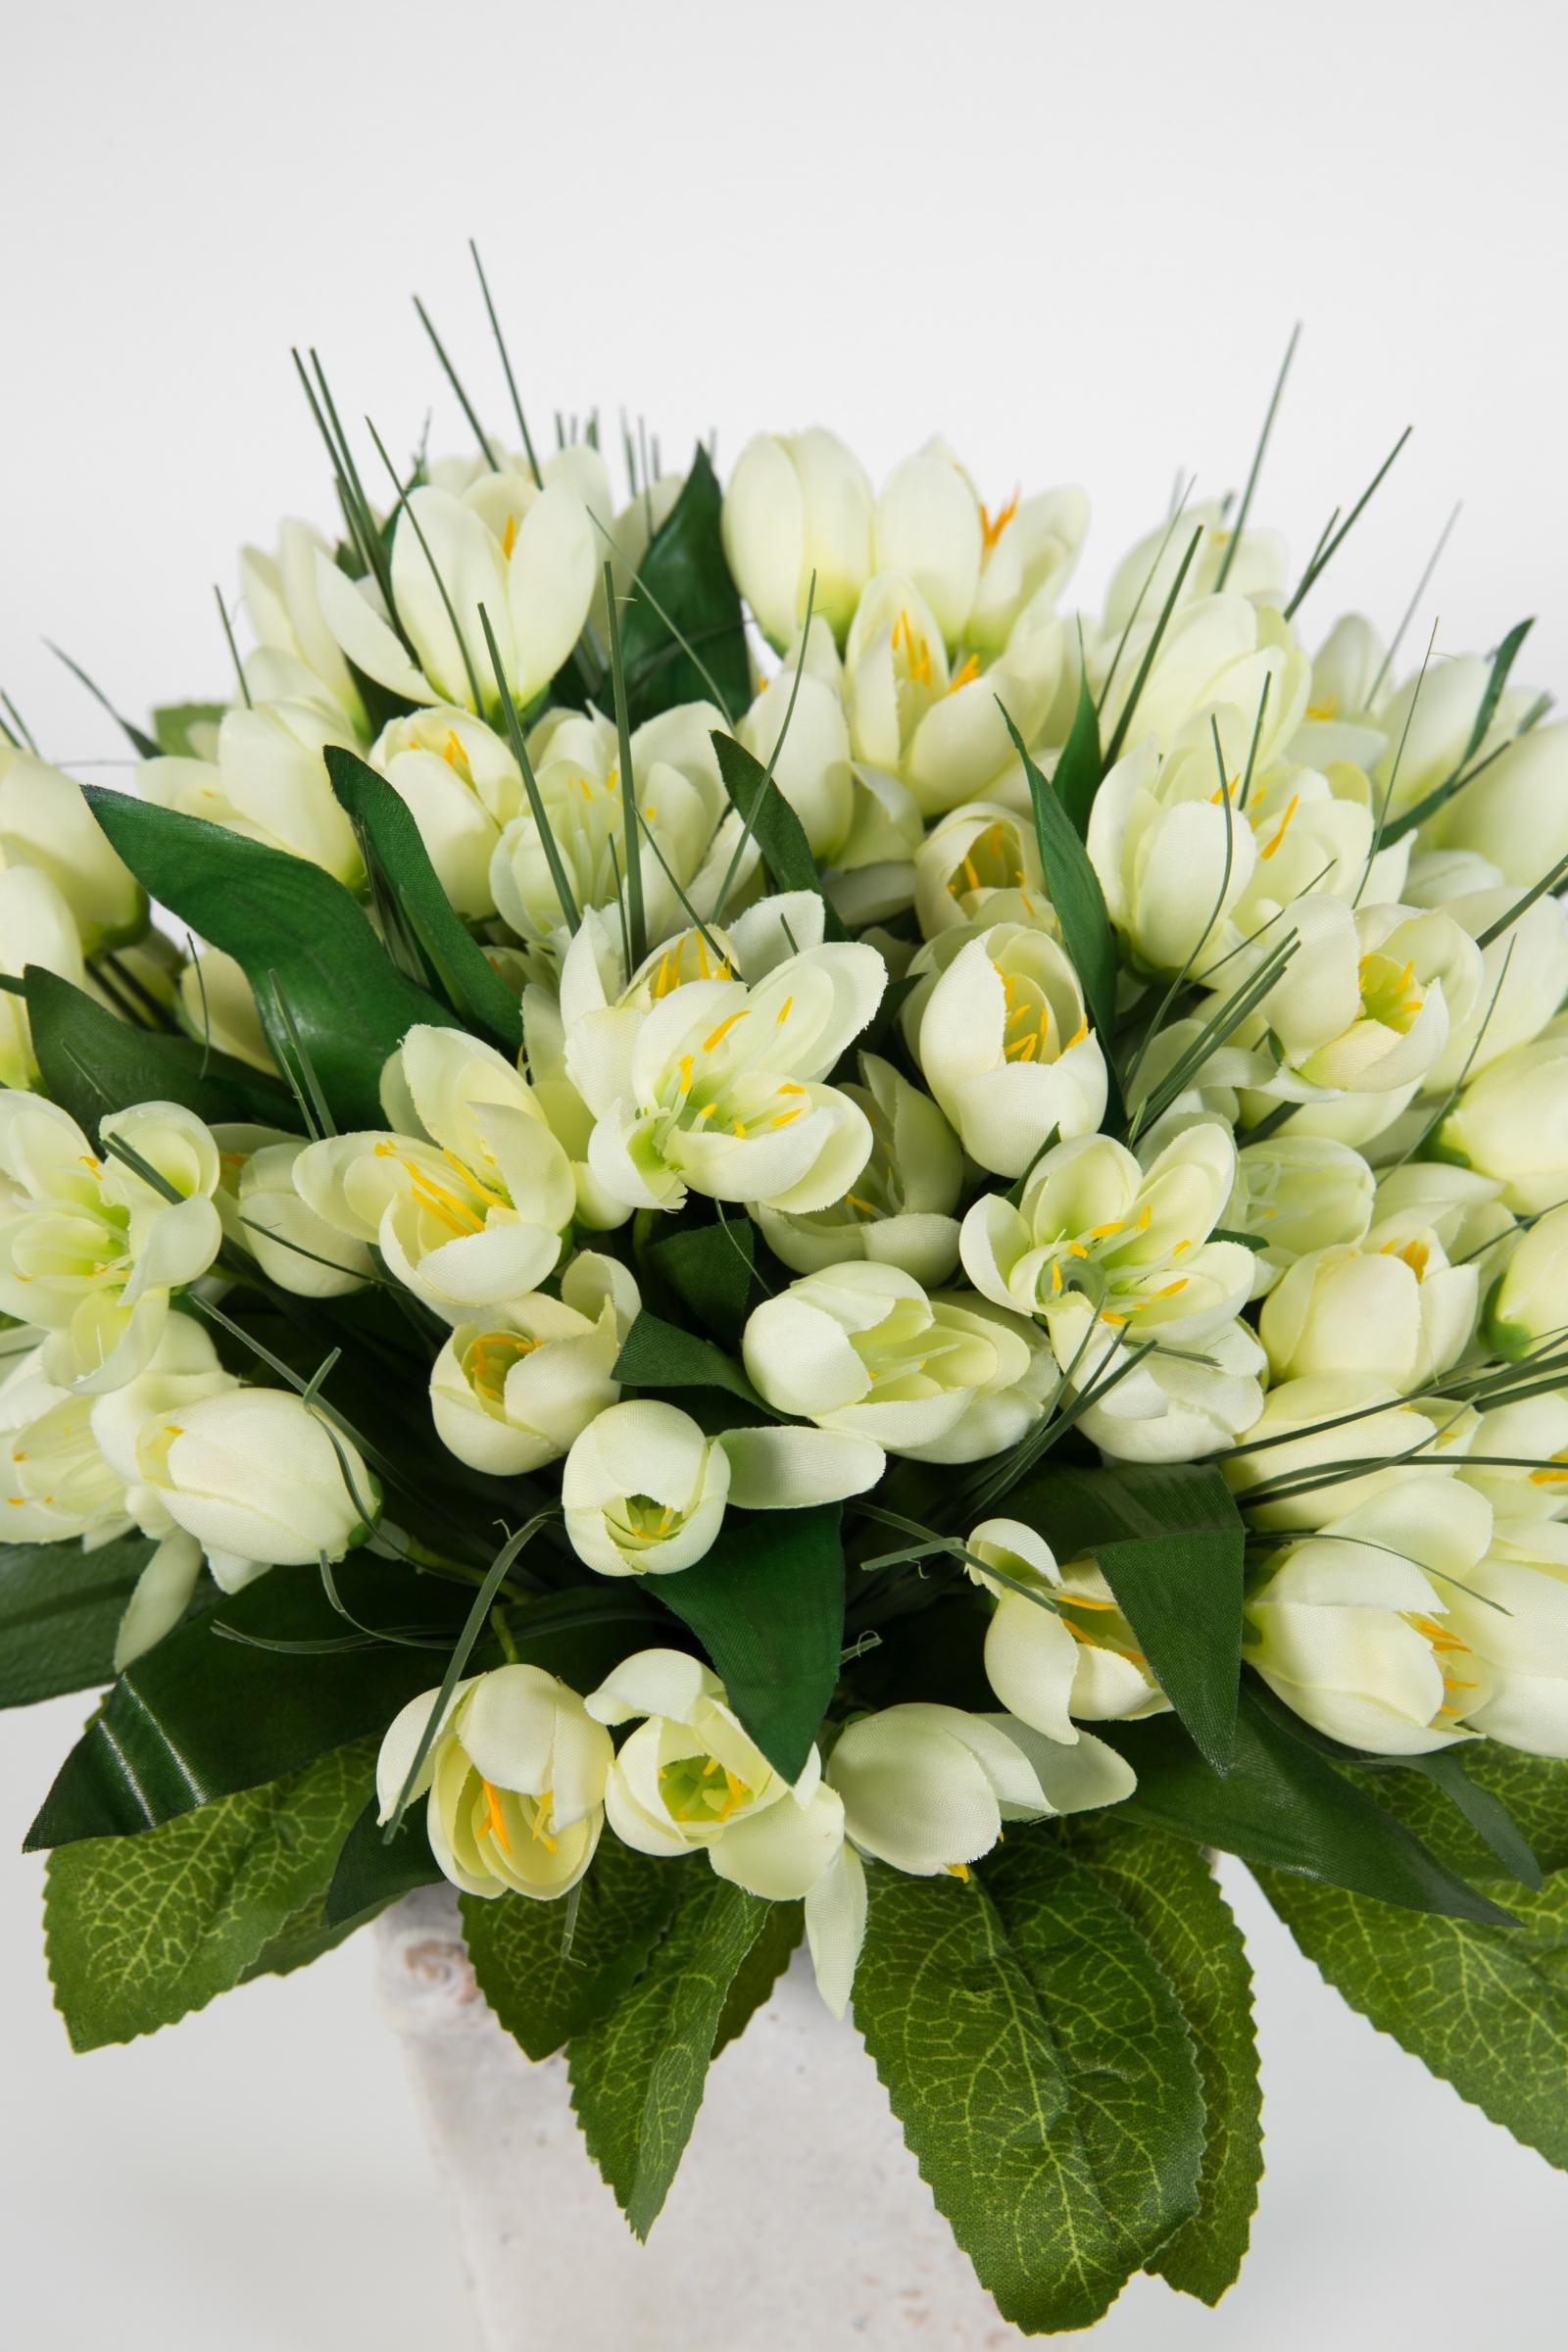 DP Kunstblumen Frühlingsblumen Kunstpflanze Wiesenblumengras 38cm weiß im Dekot